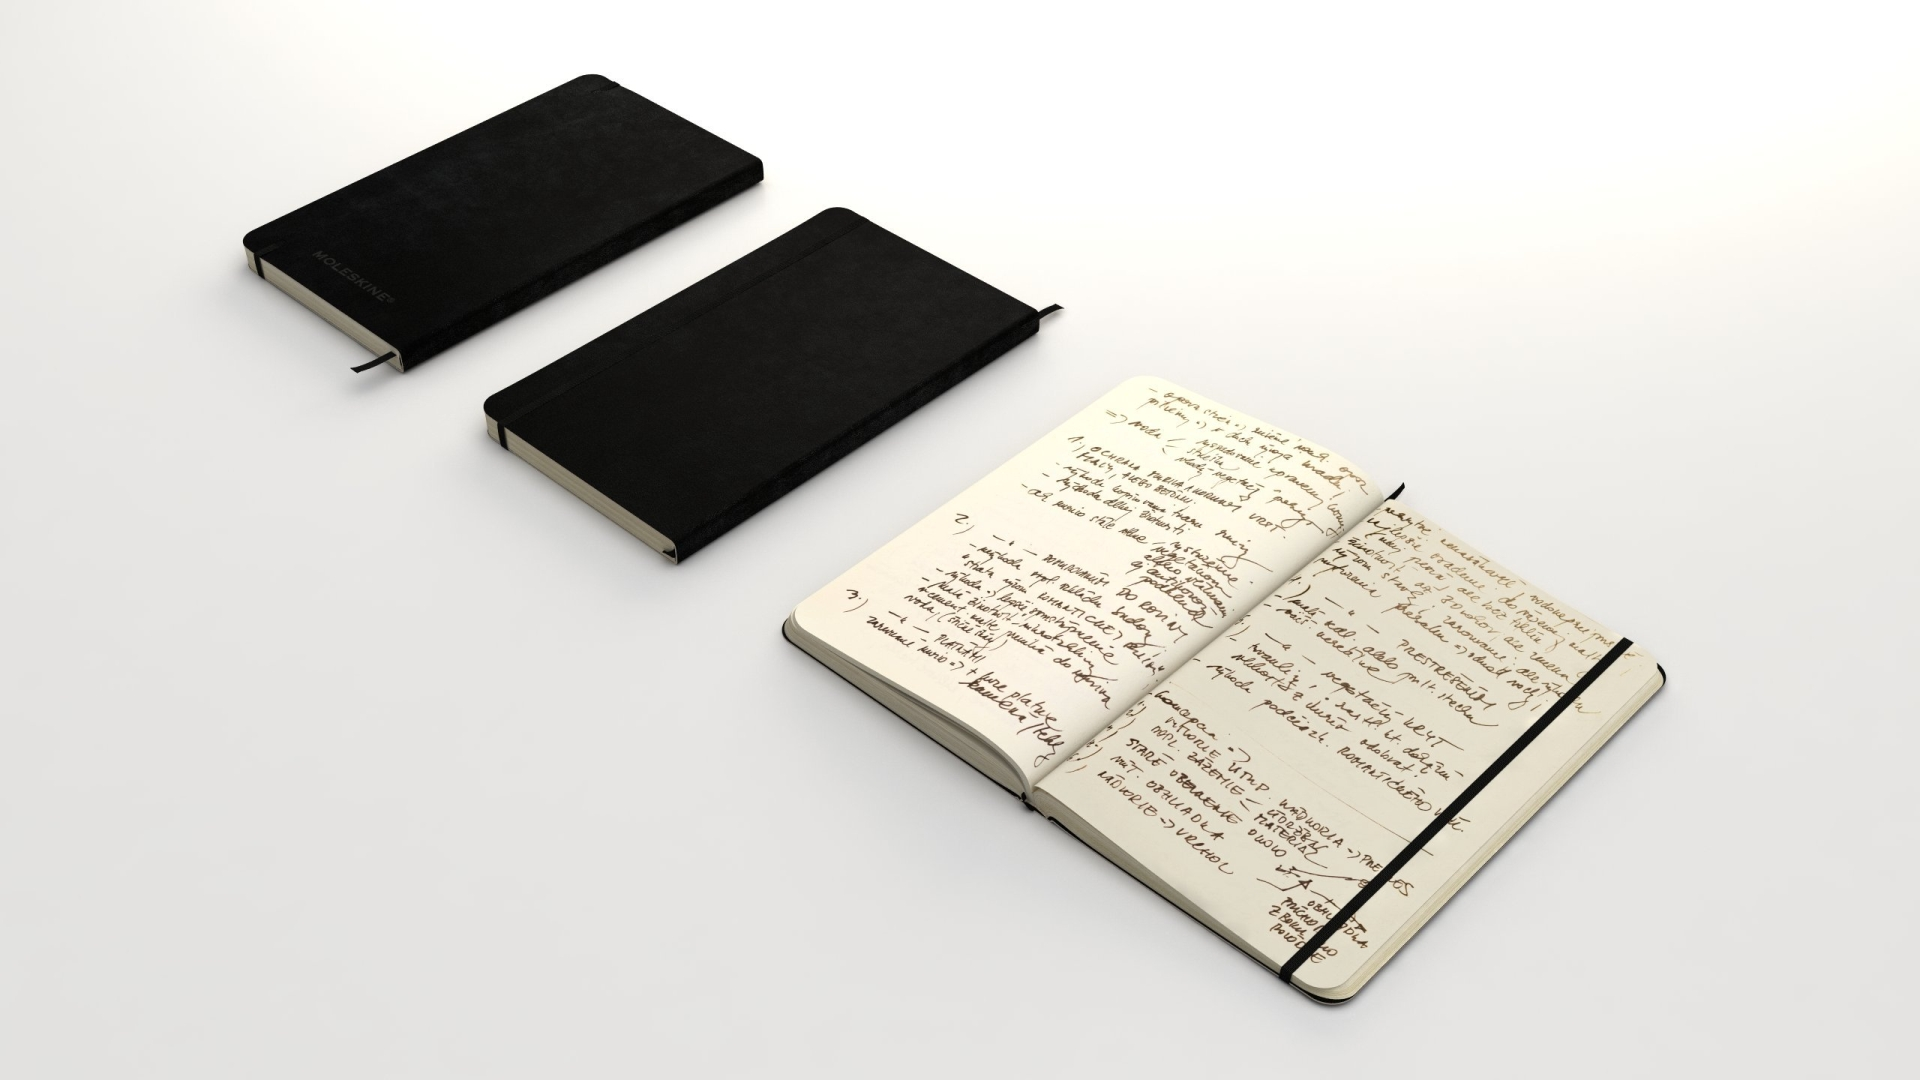 Moleskine classic notebook 13x21cm | FlyingArchitecture